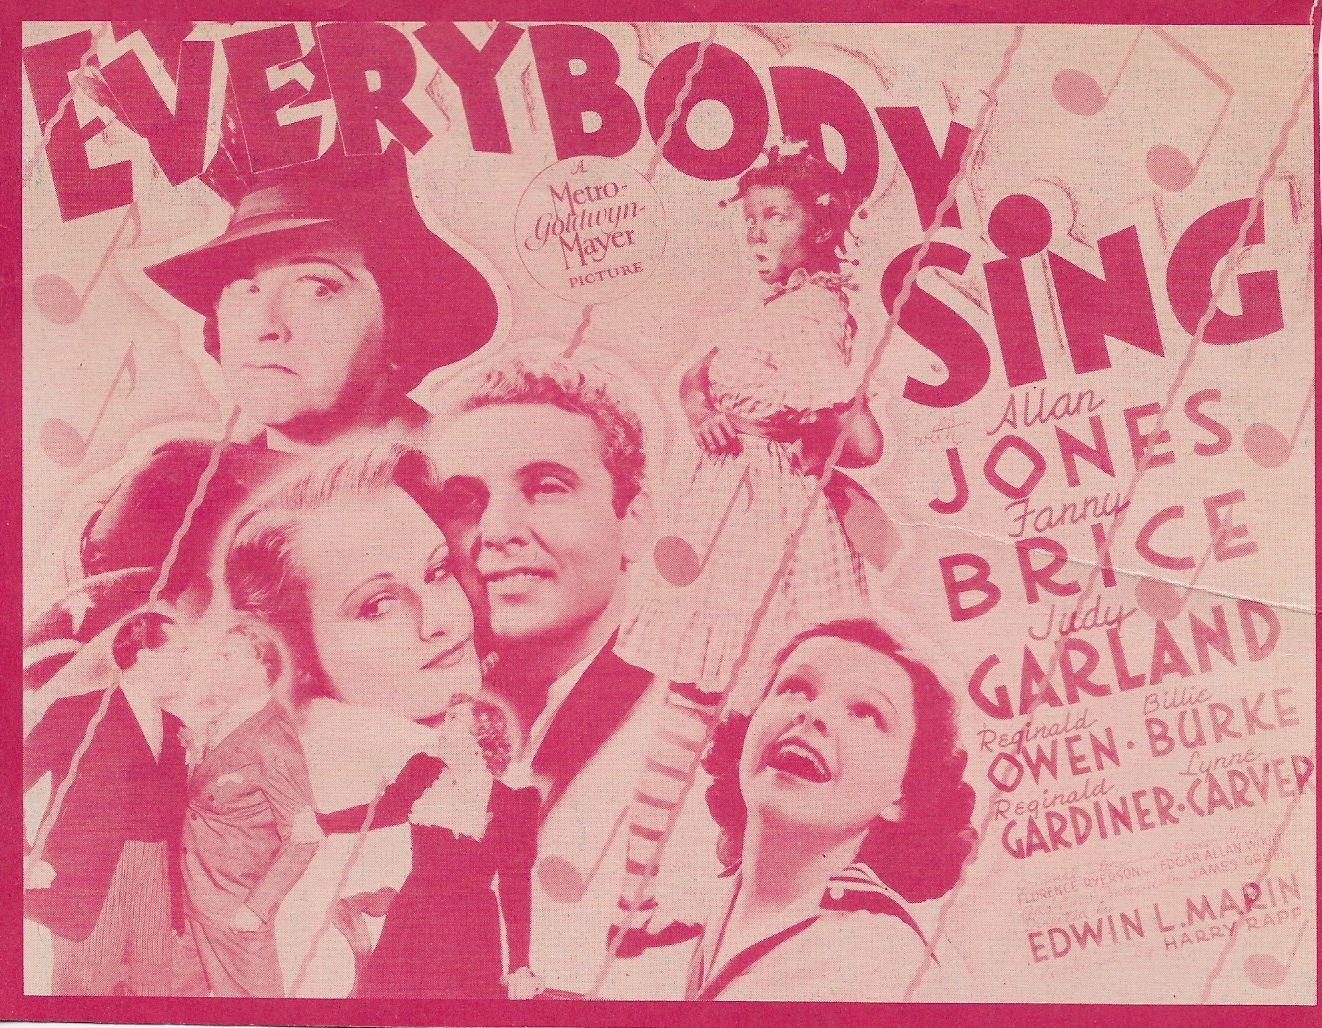 Judy Garland, Fanny Brice, Allan Jones, Reginald Owen, and Helen Troy in Everybody Sing (1938)